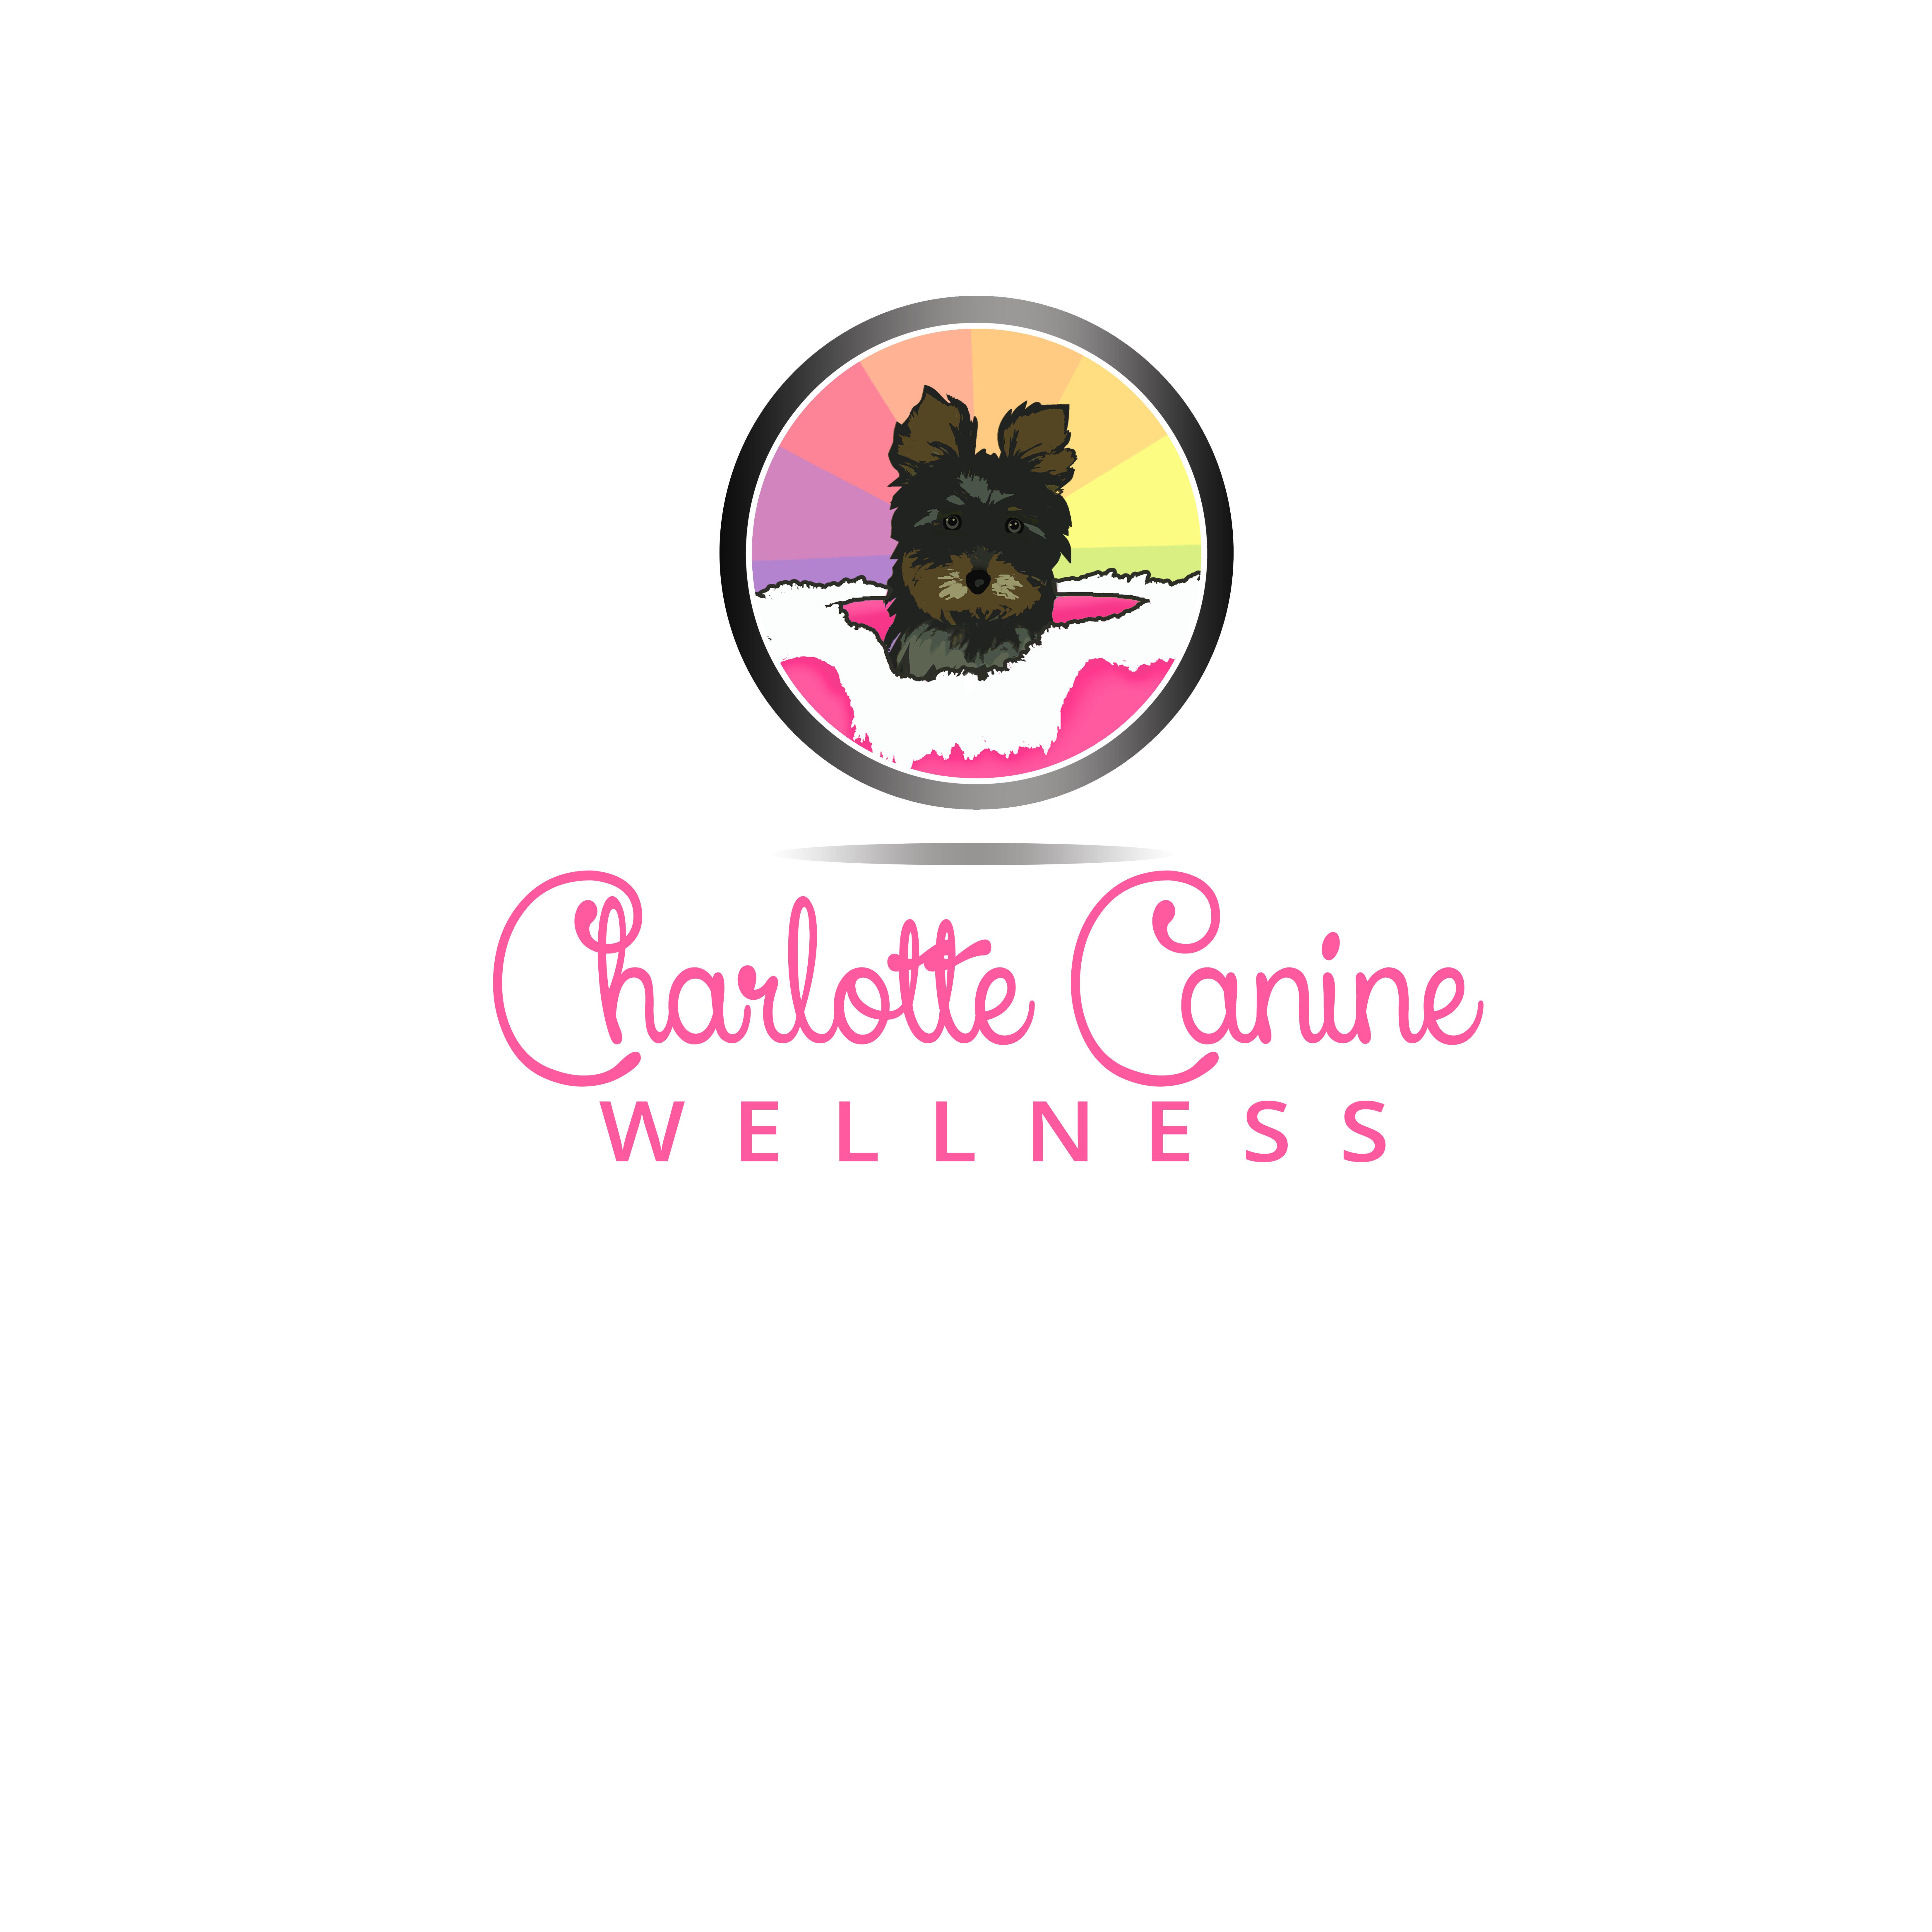 Logo Design by Allan Esclamado - Entry No. 93 in the Logo Design Contest New Logo Design for Charlotte Canine Wellness.